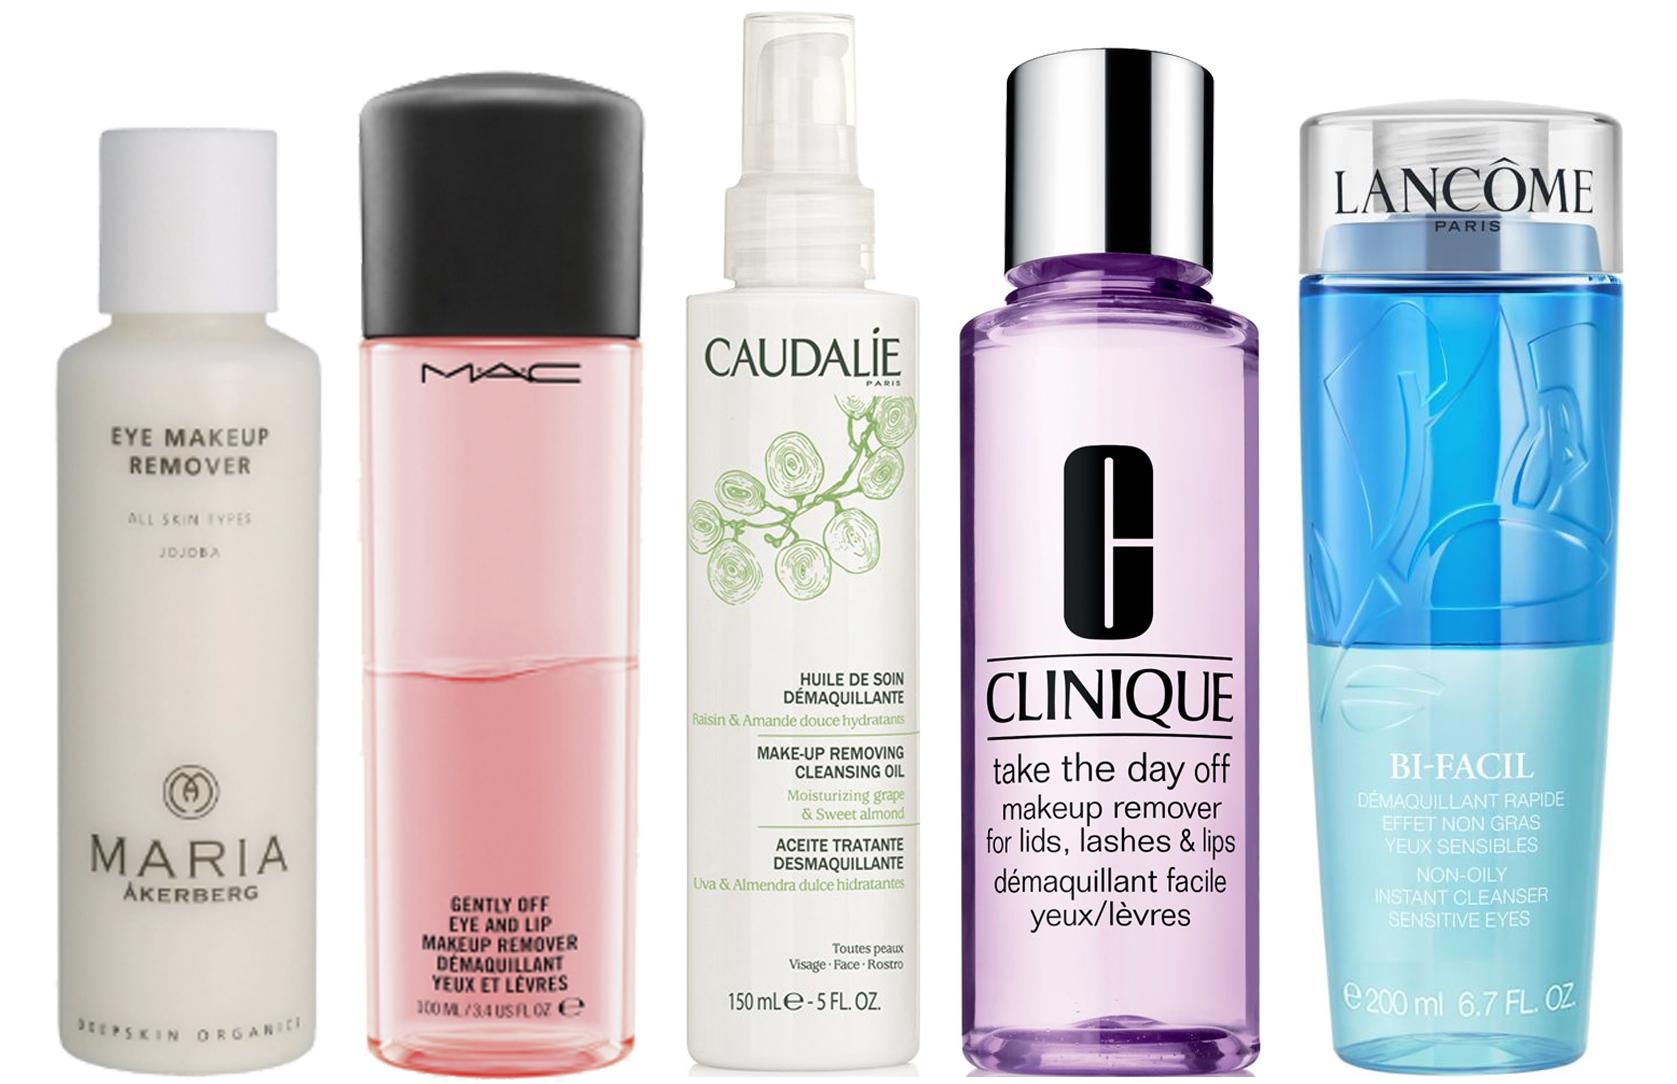 ta bort vattenfast mascara tips